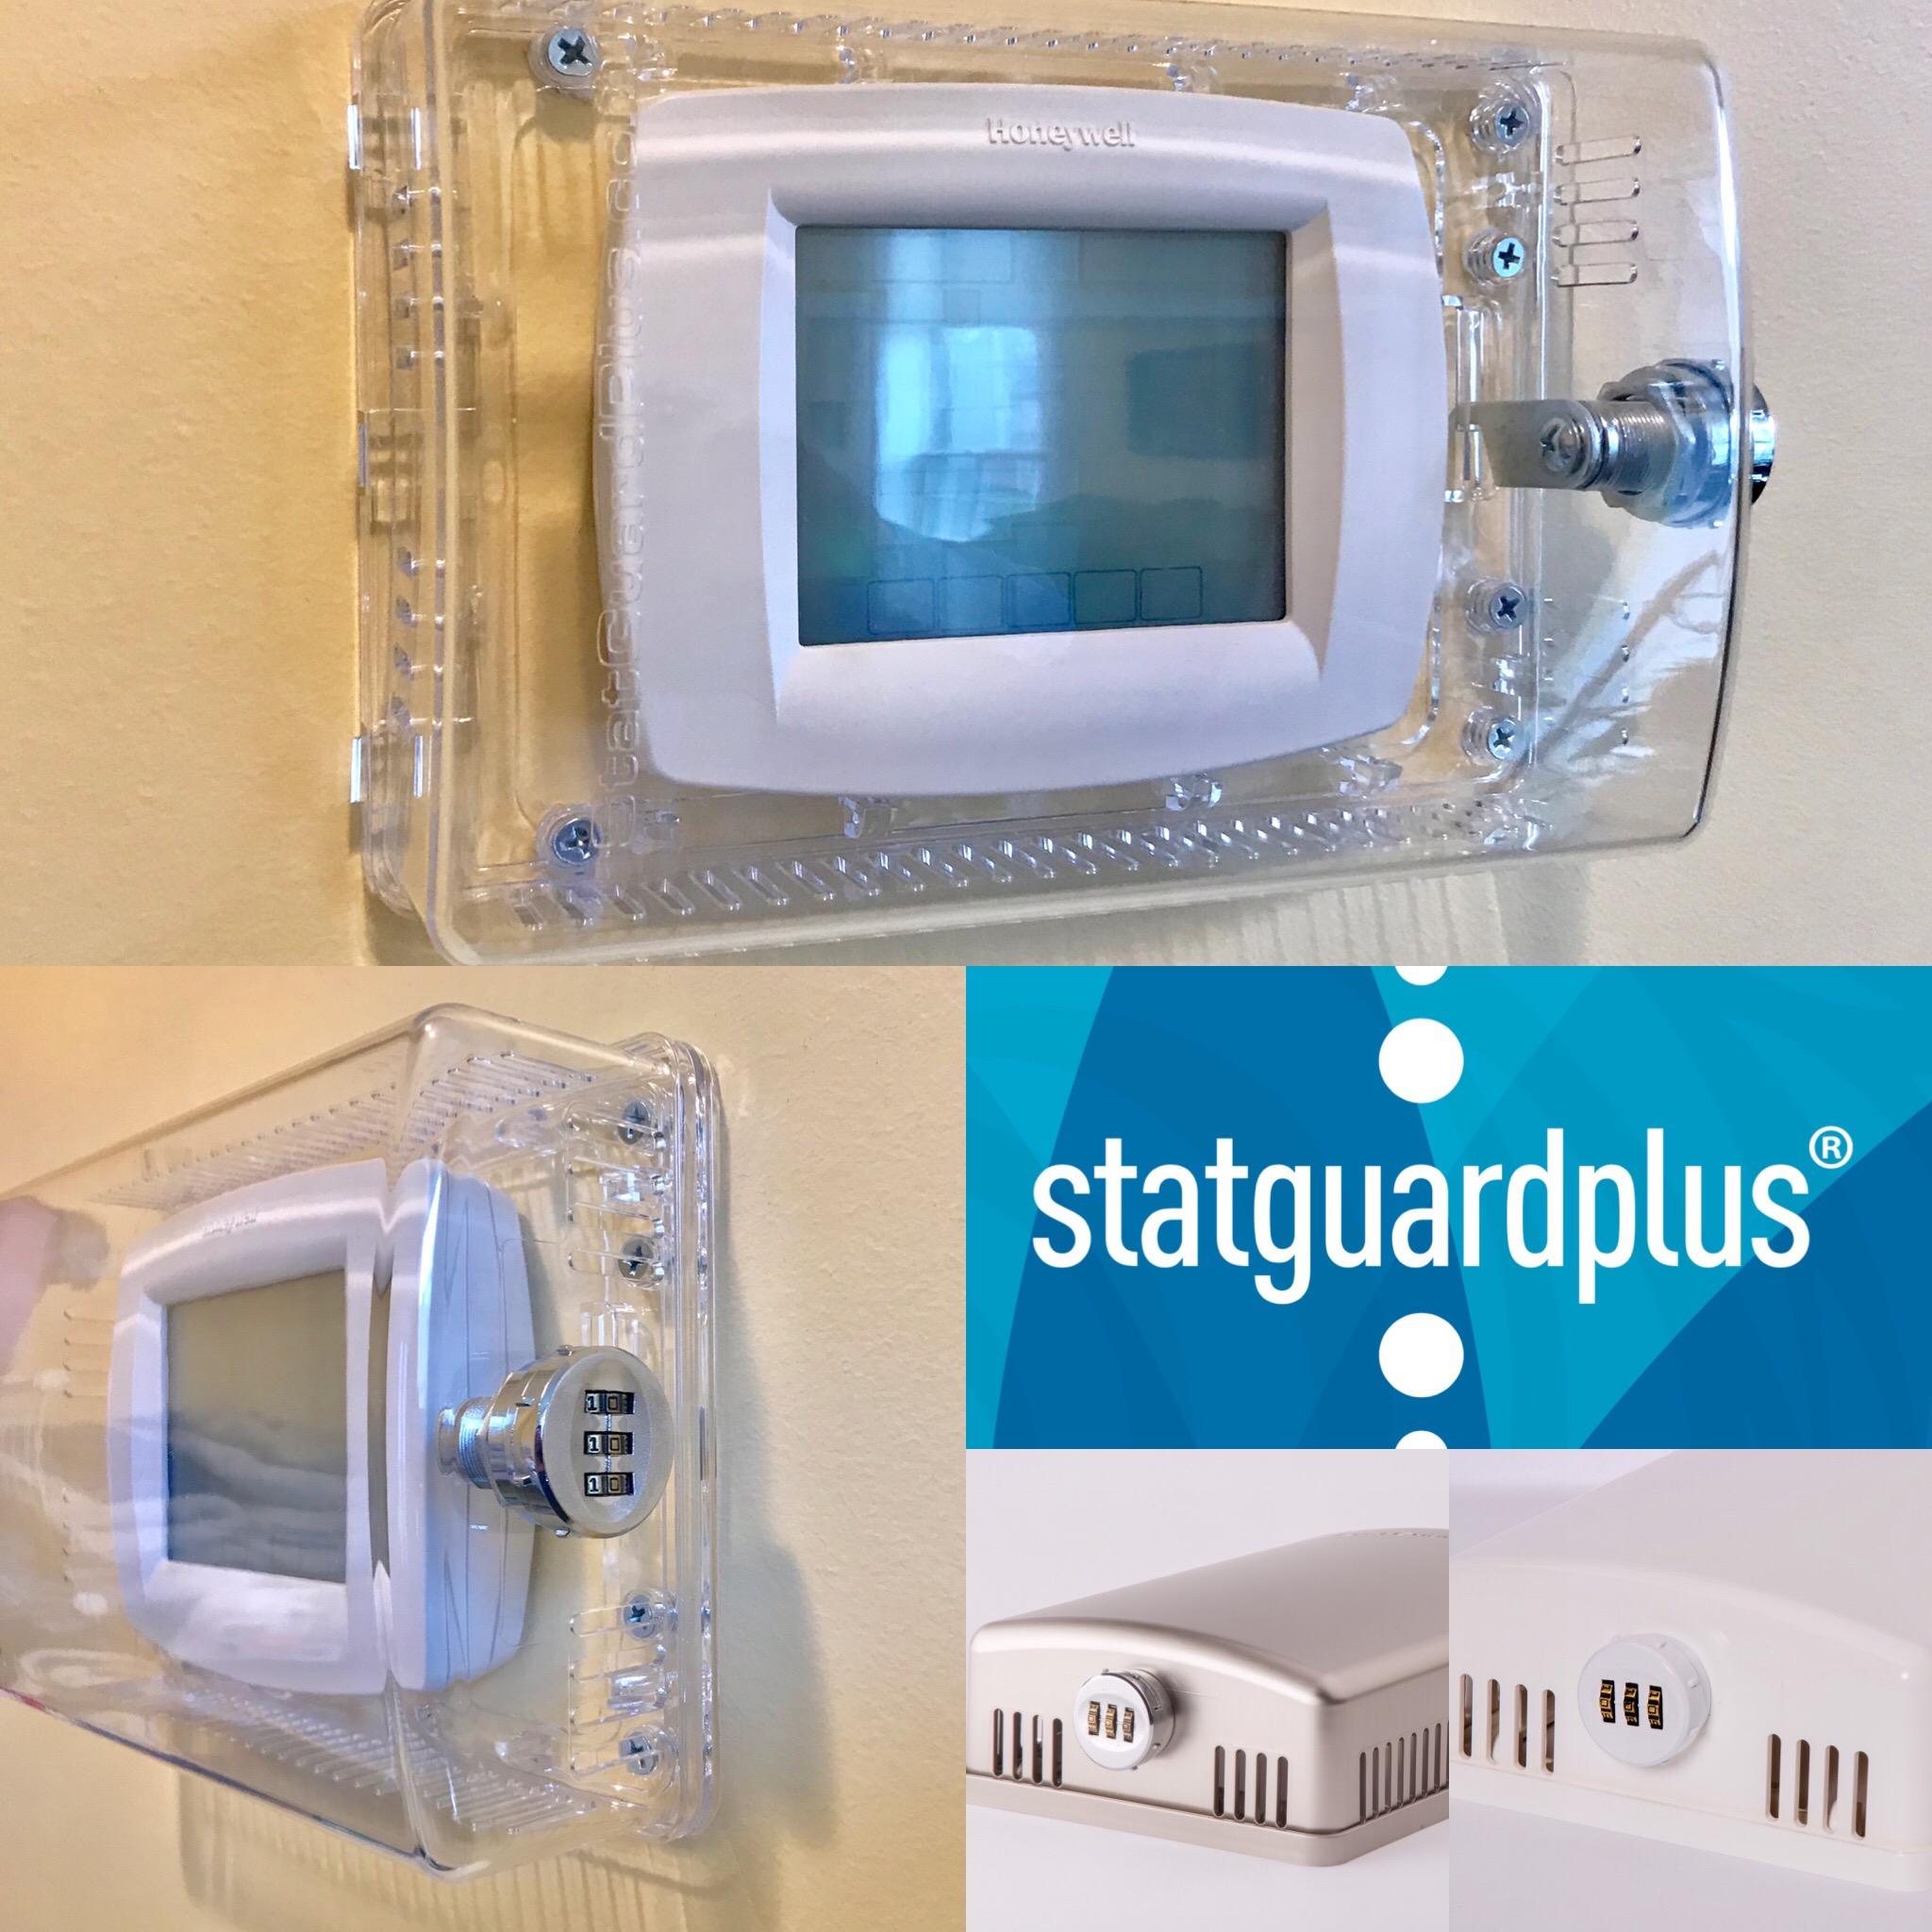 StatGuardPlus image 3.JPG